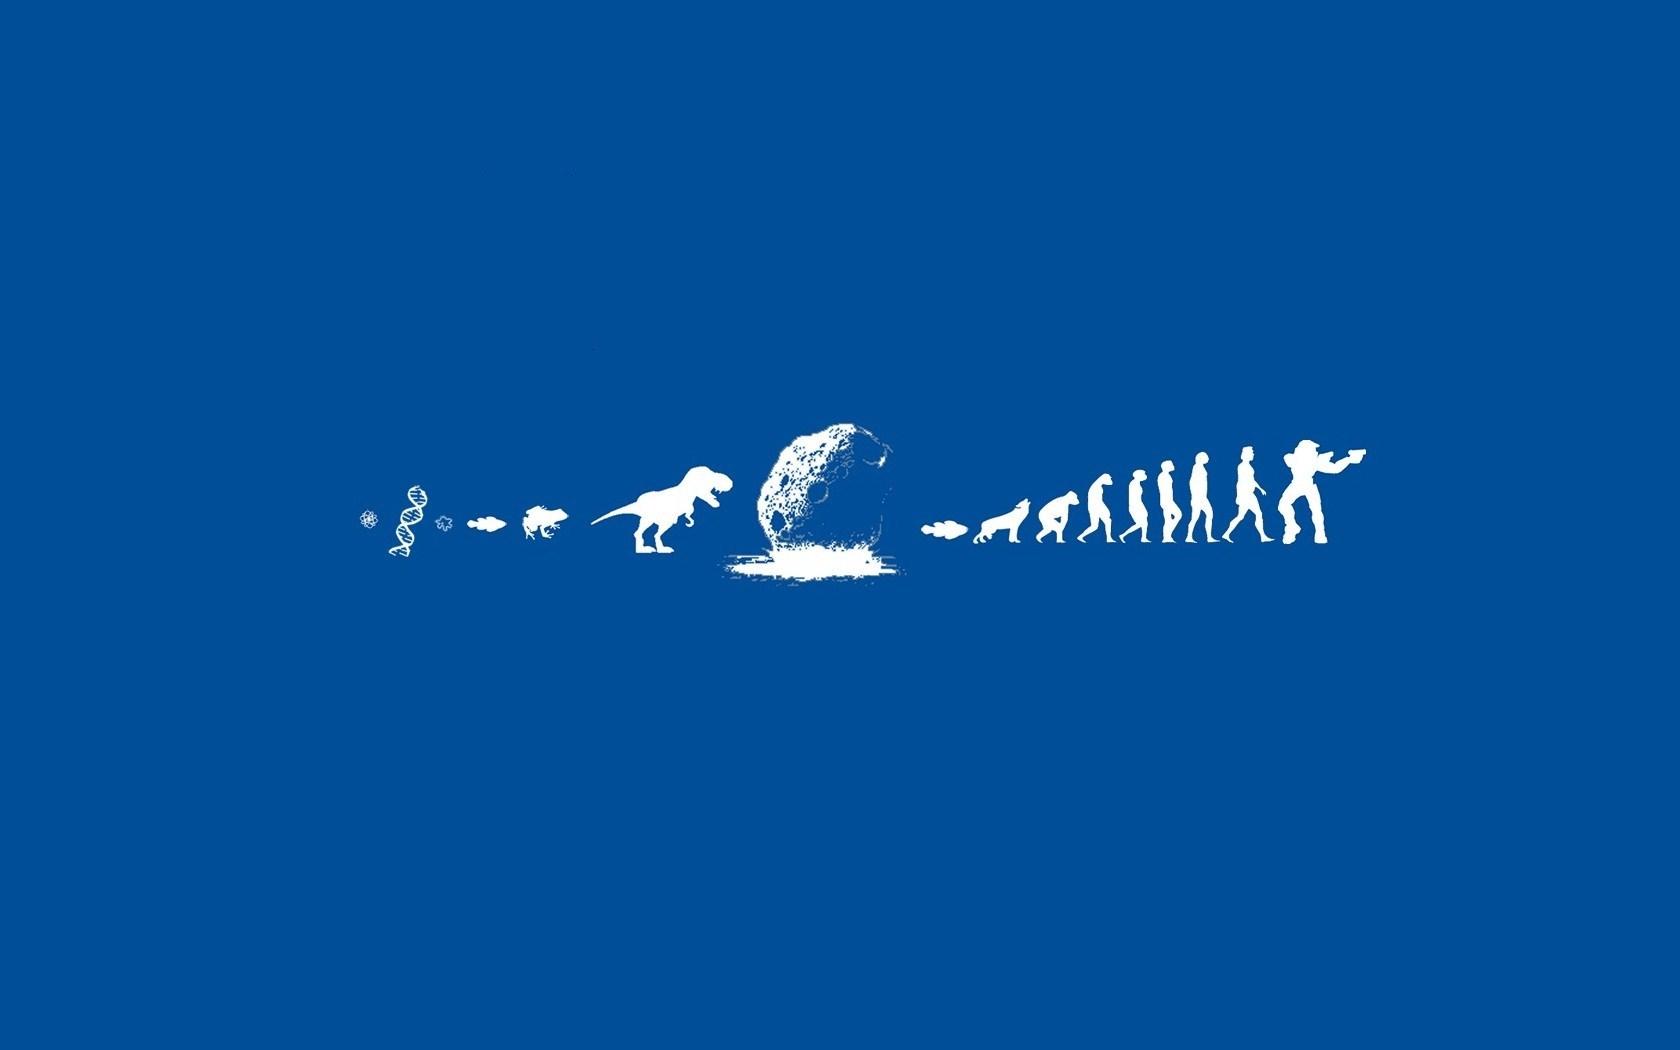 Marvellous Human Evolution Creative Hd Wallpaper